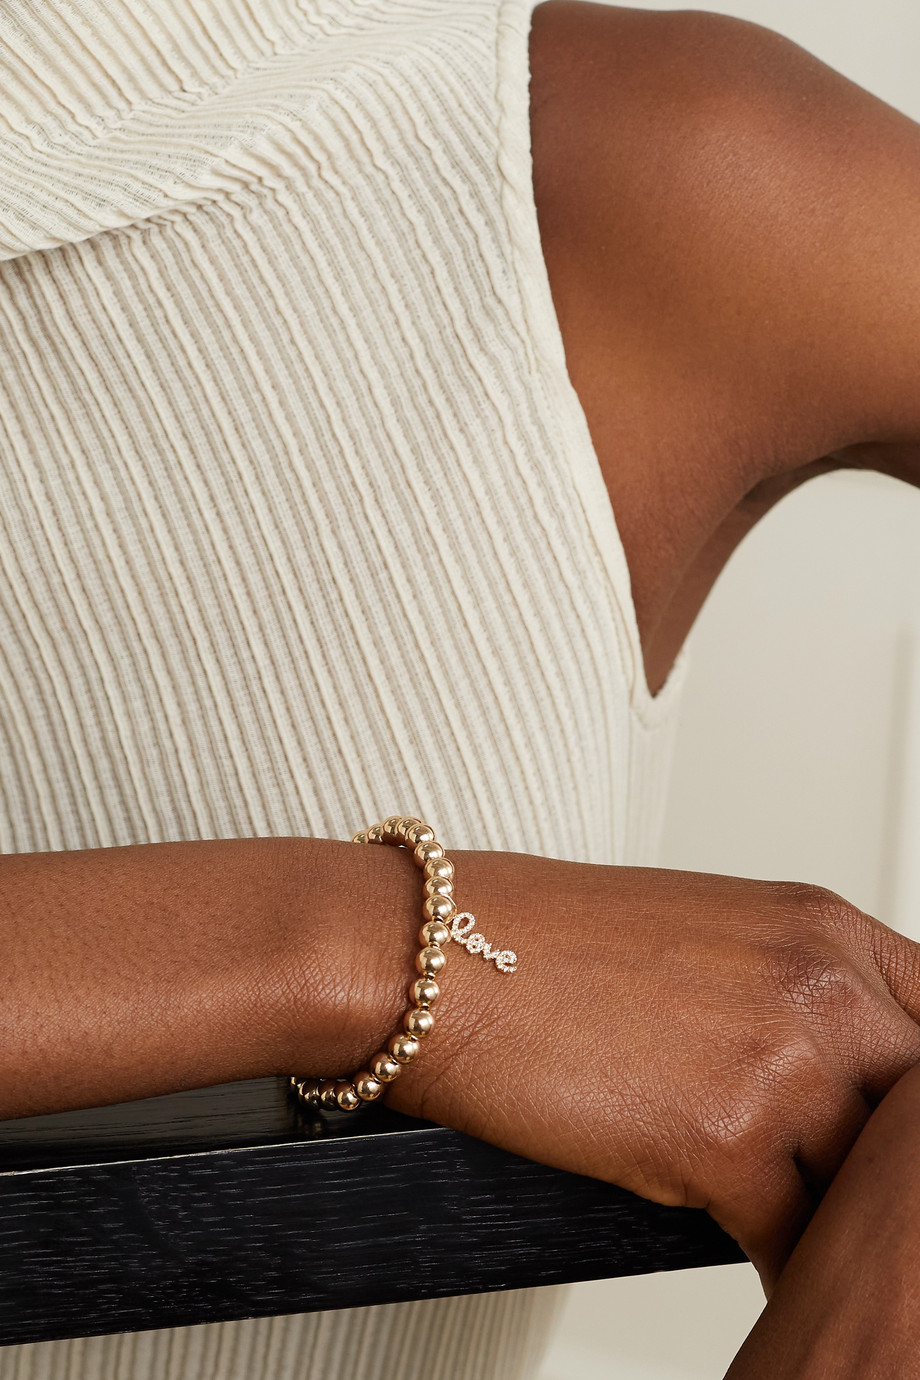 Sydney Evan Small Love 14-karat gold diamond bracelet